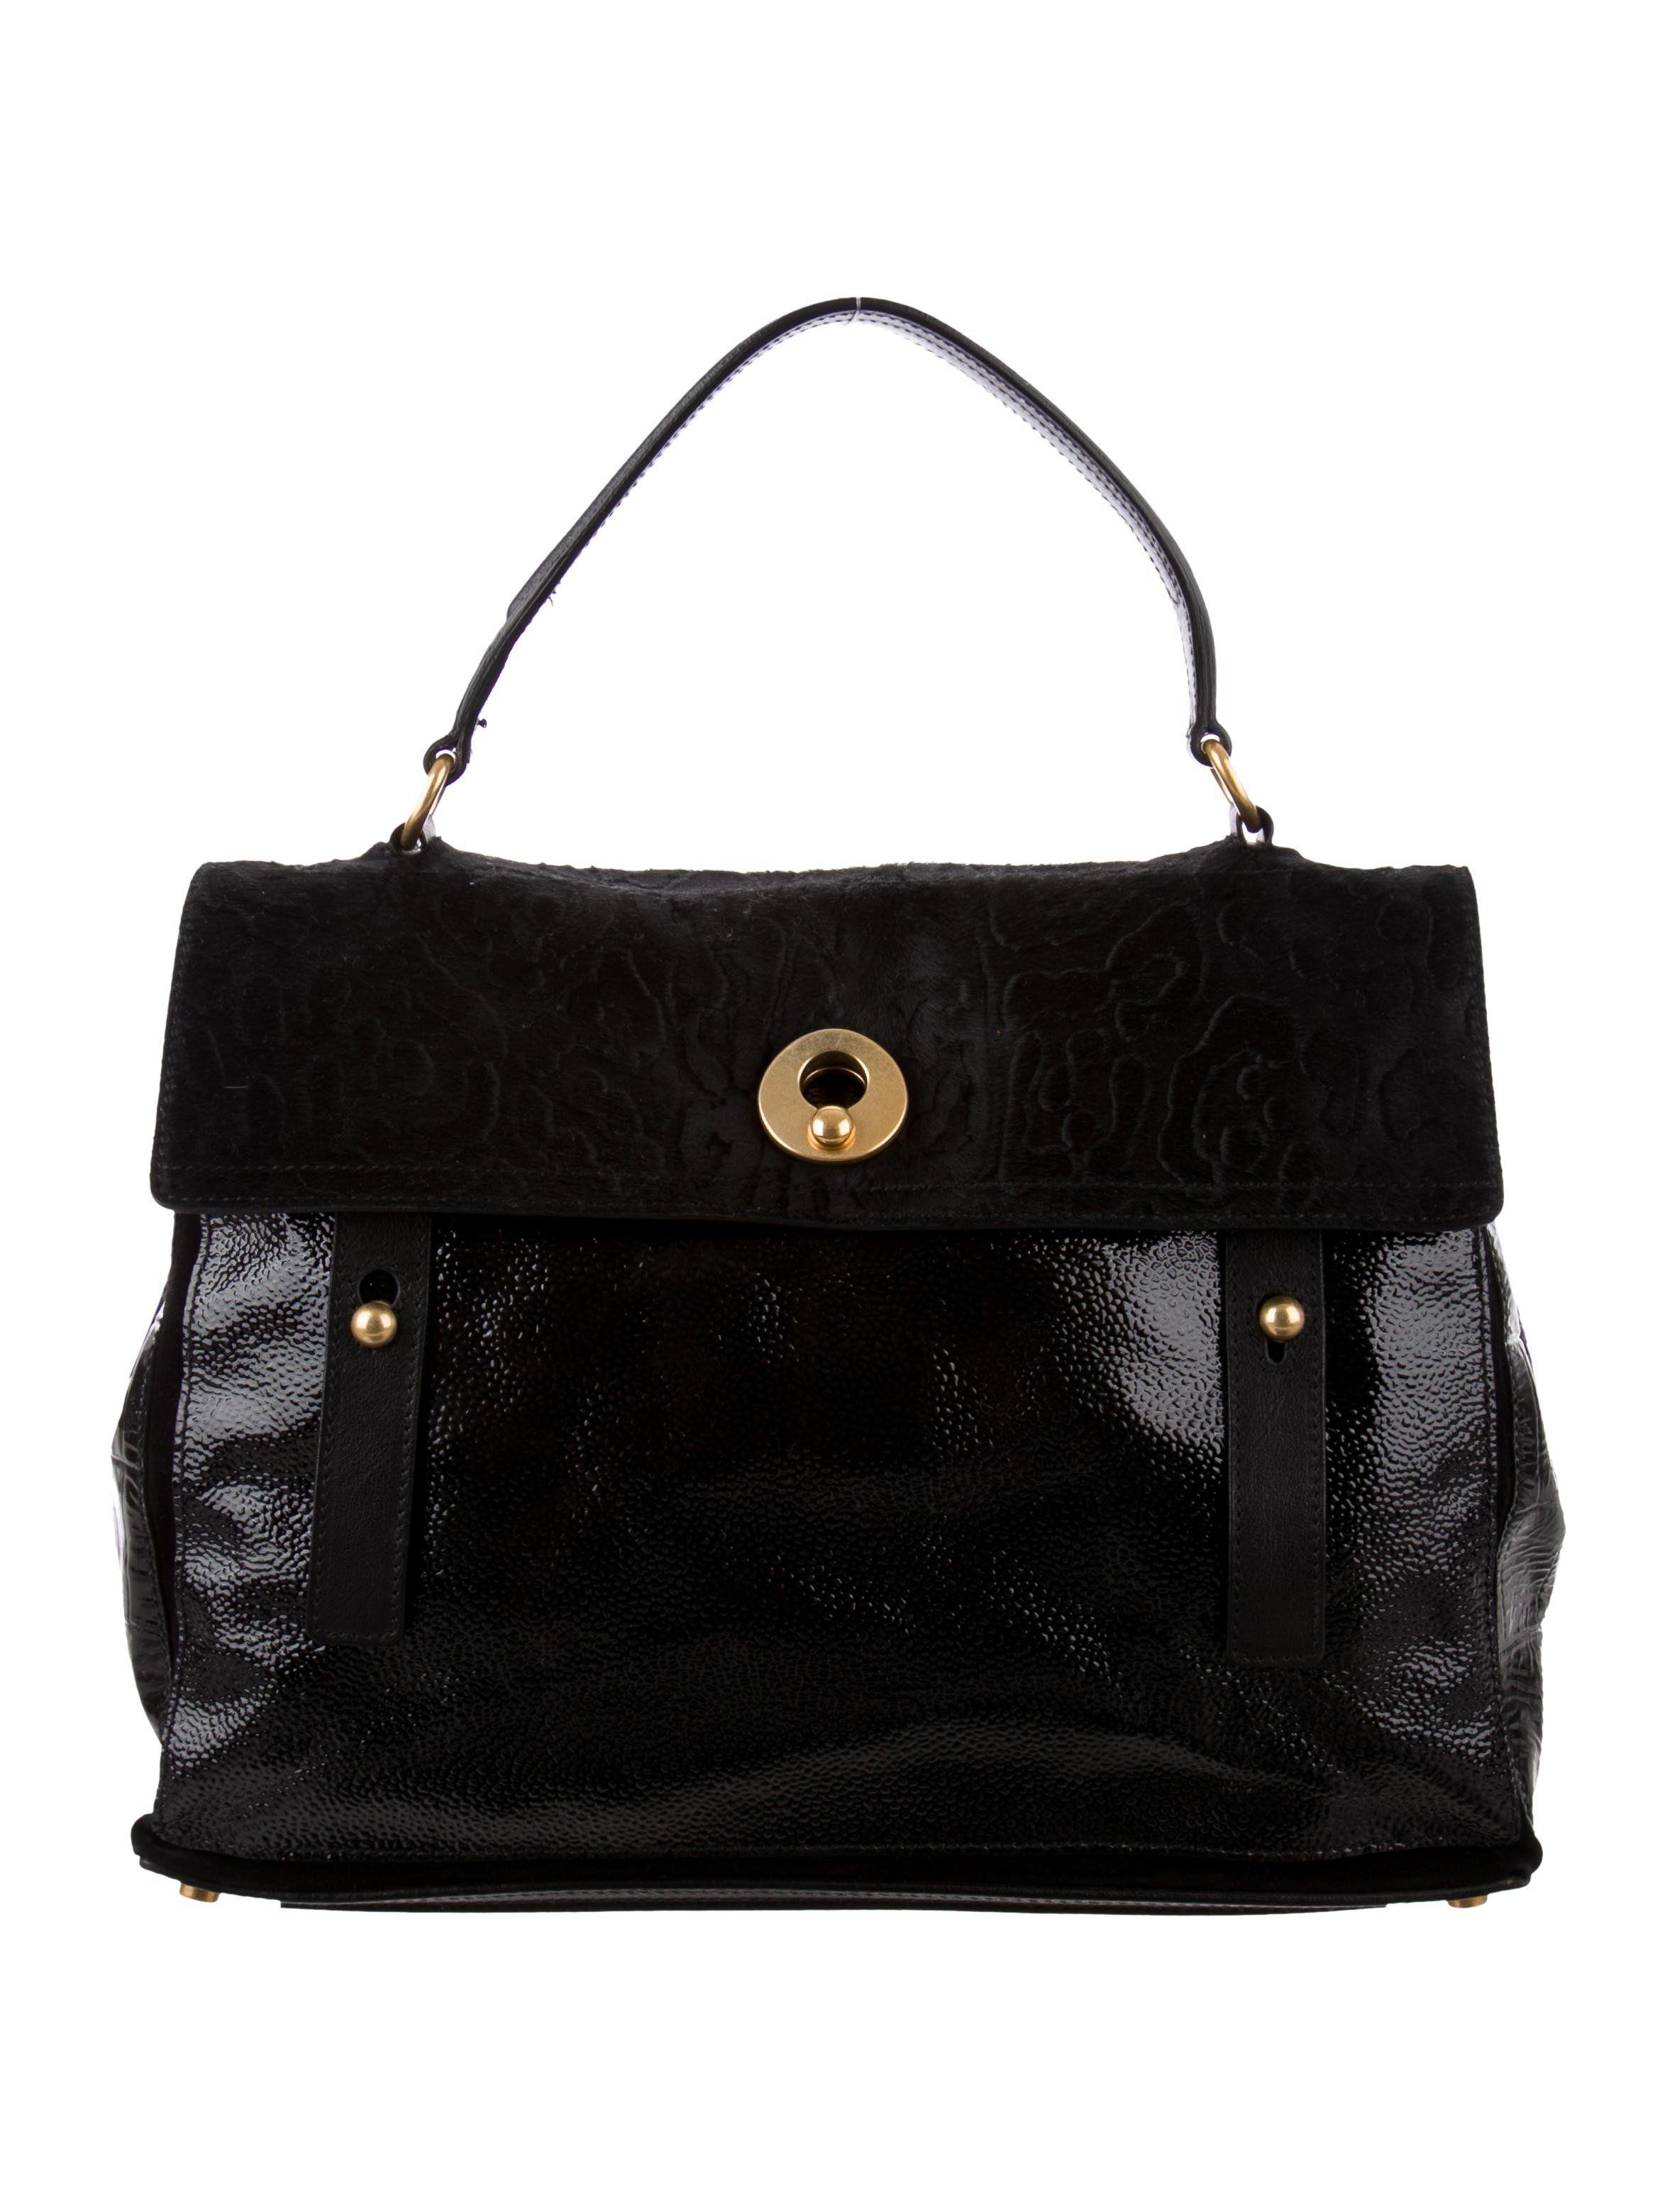 Yves Saint Laurent Medium Muse Two Bag - Handbags - YVE79461  74d2f69e77394